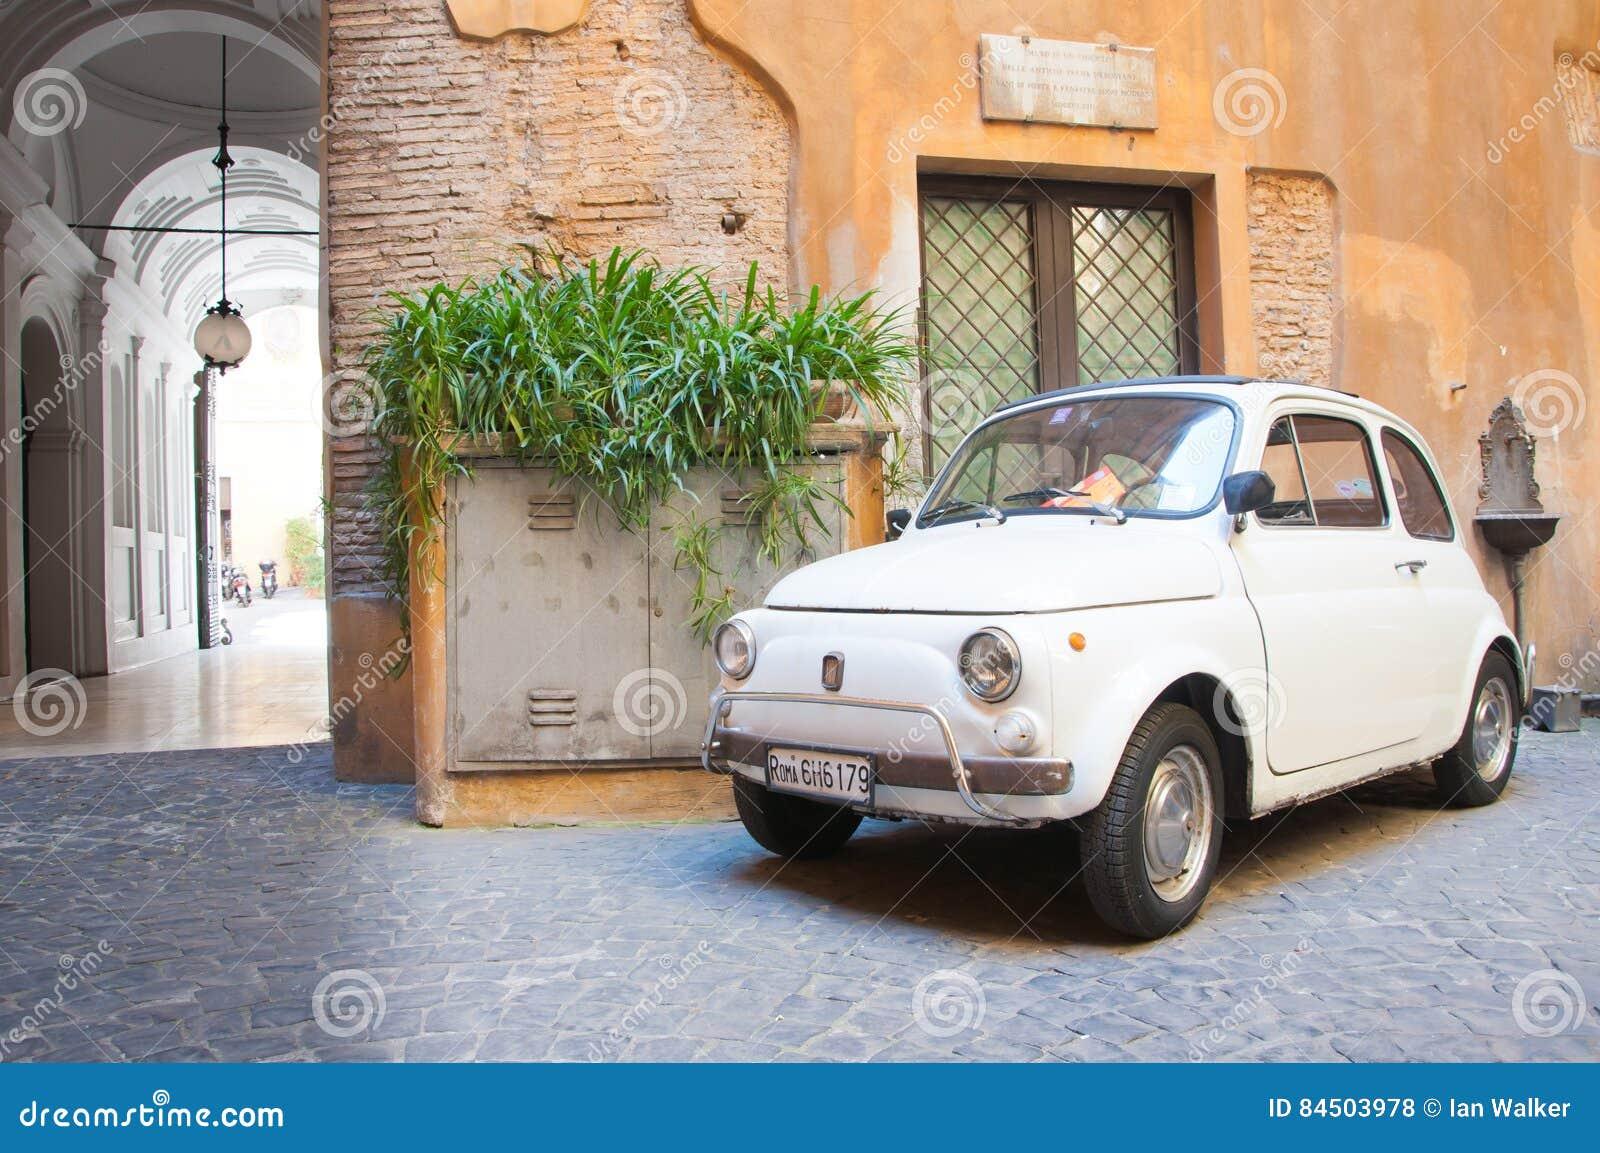 Original Fiat 500 Car Editorial Stock Photo Image Of Italian 84503978